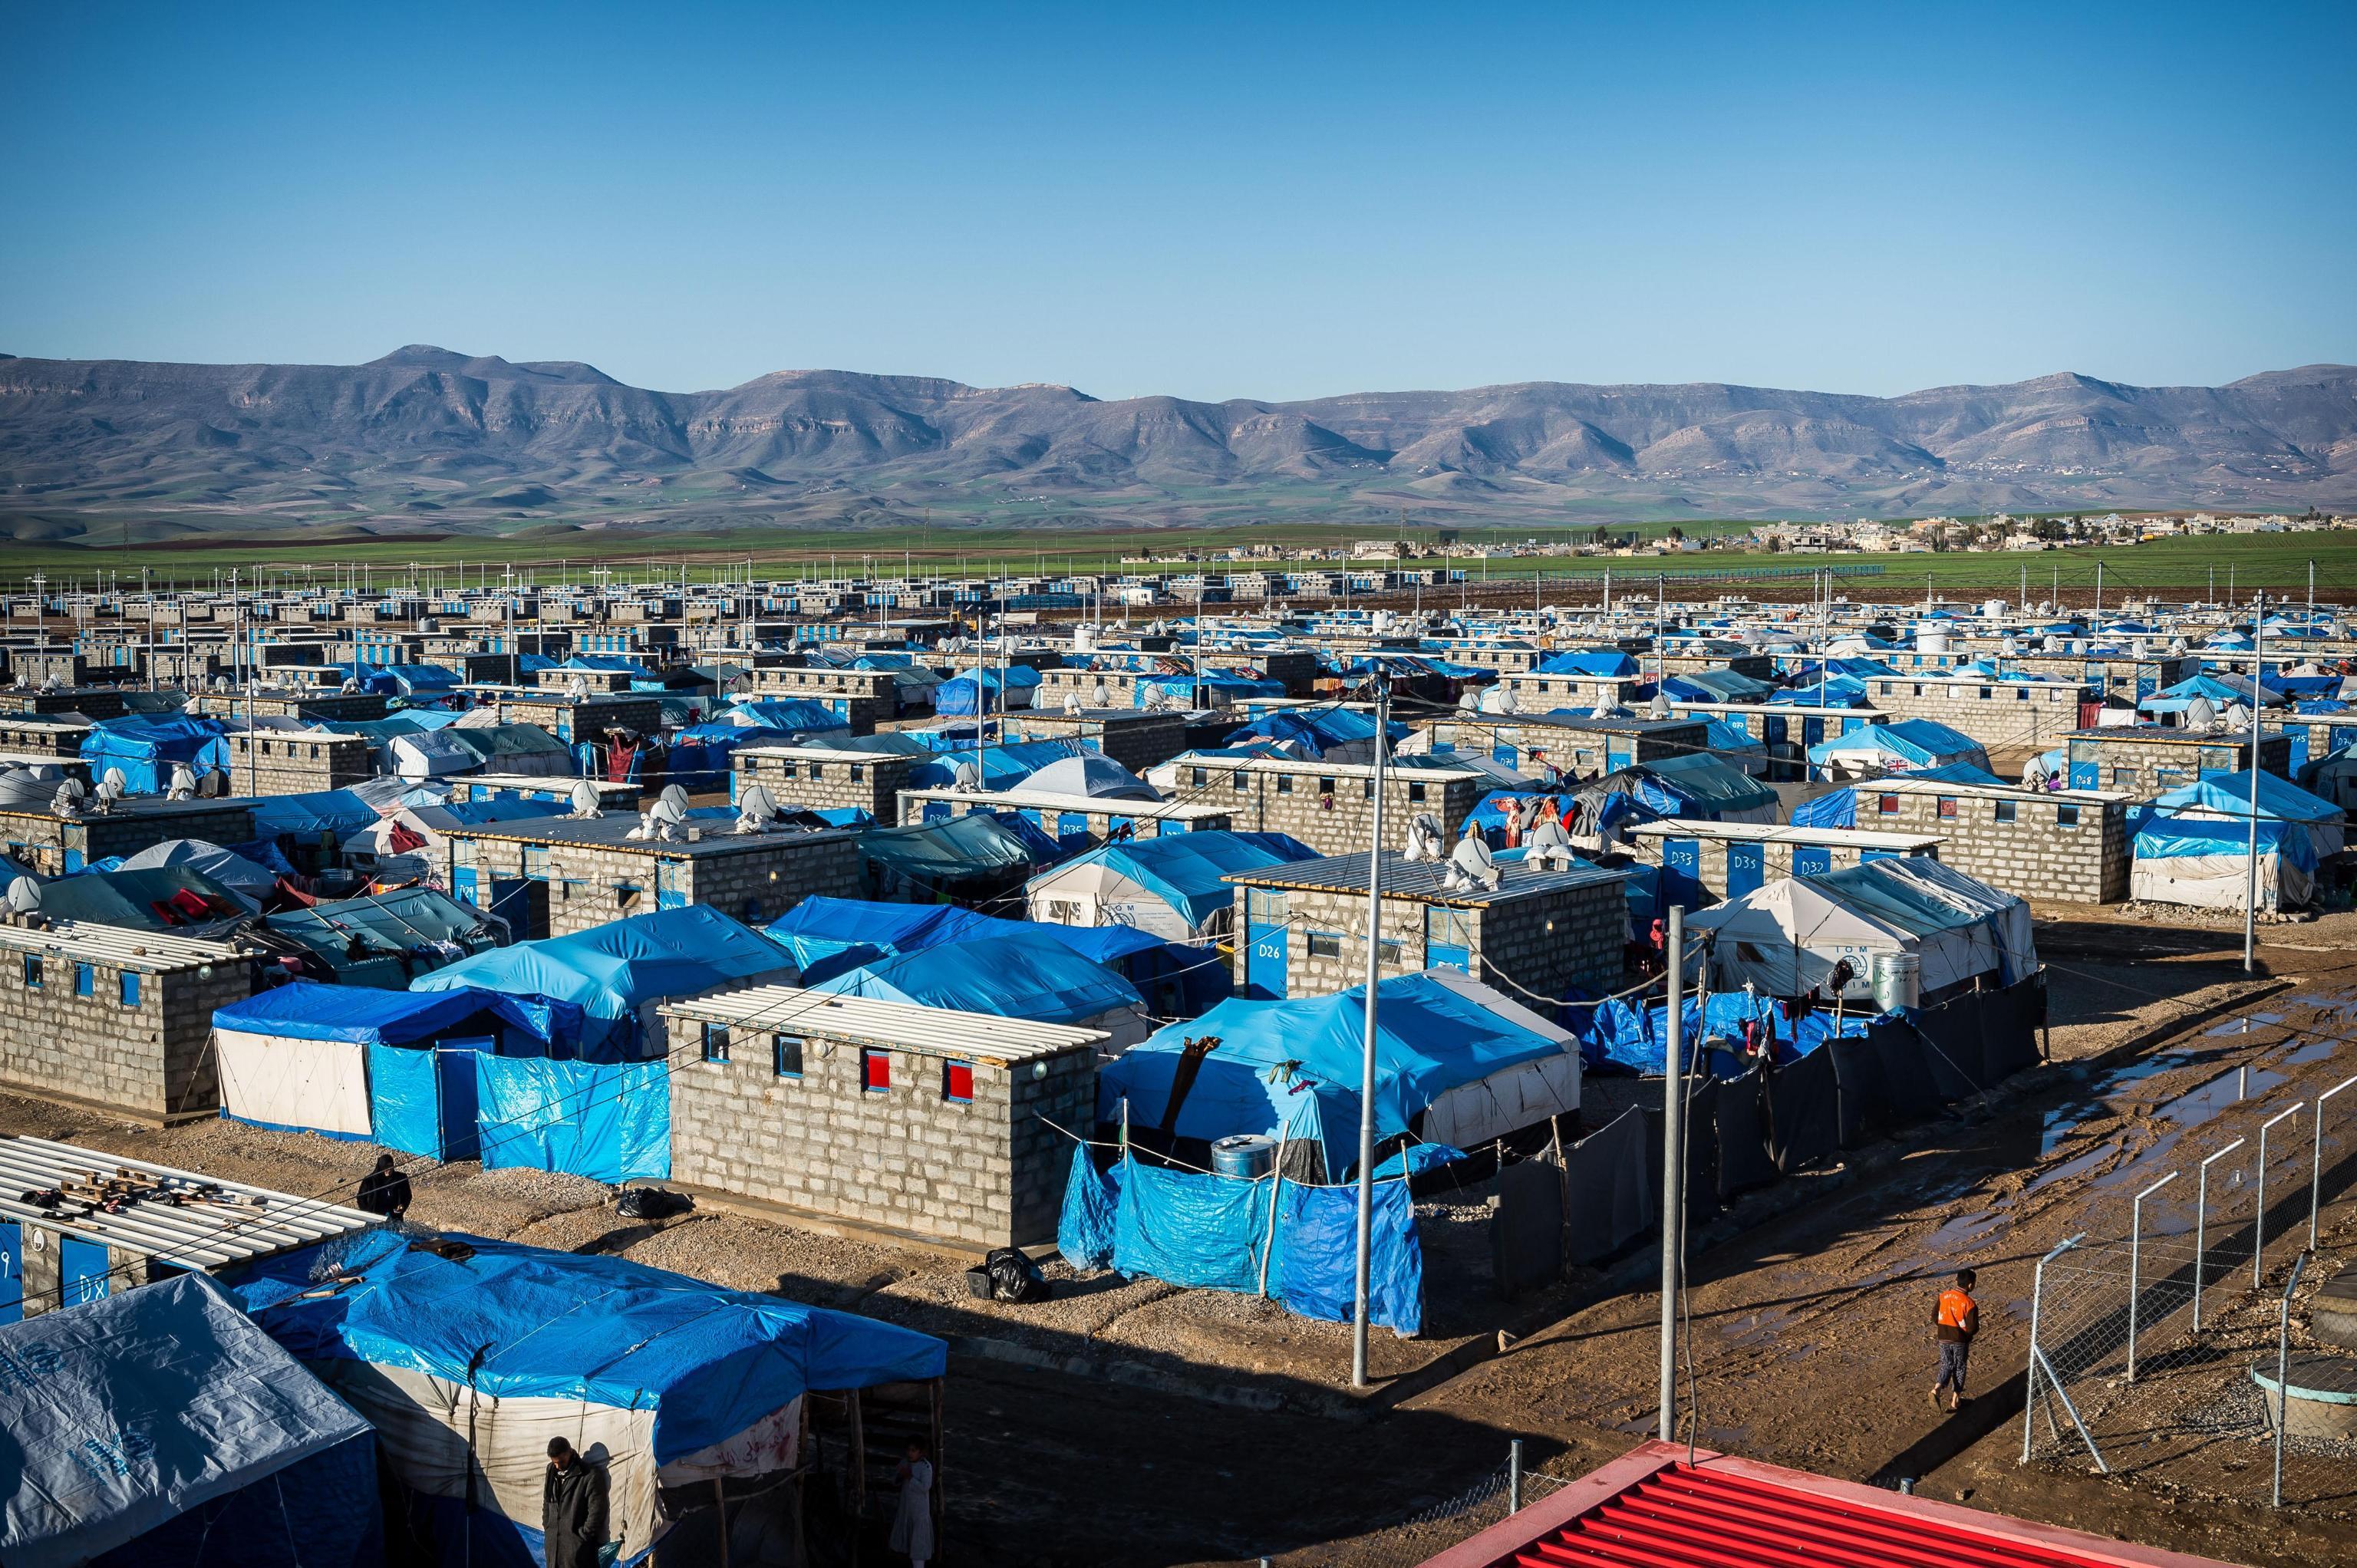 Sisma Iraq, danni a strutture Emergency